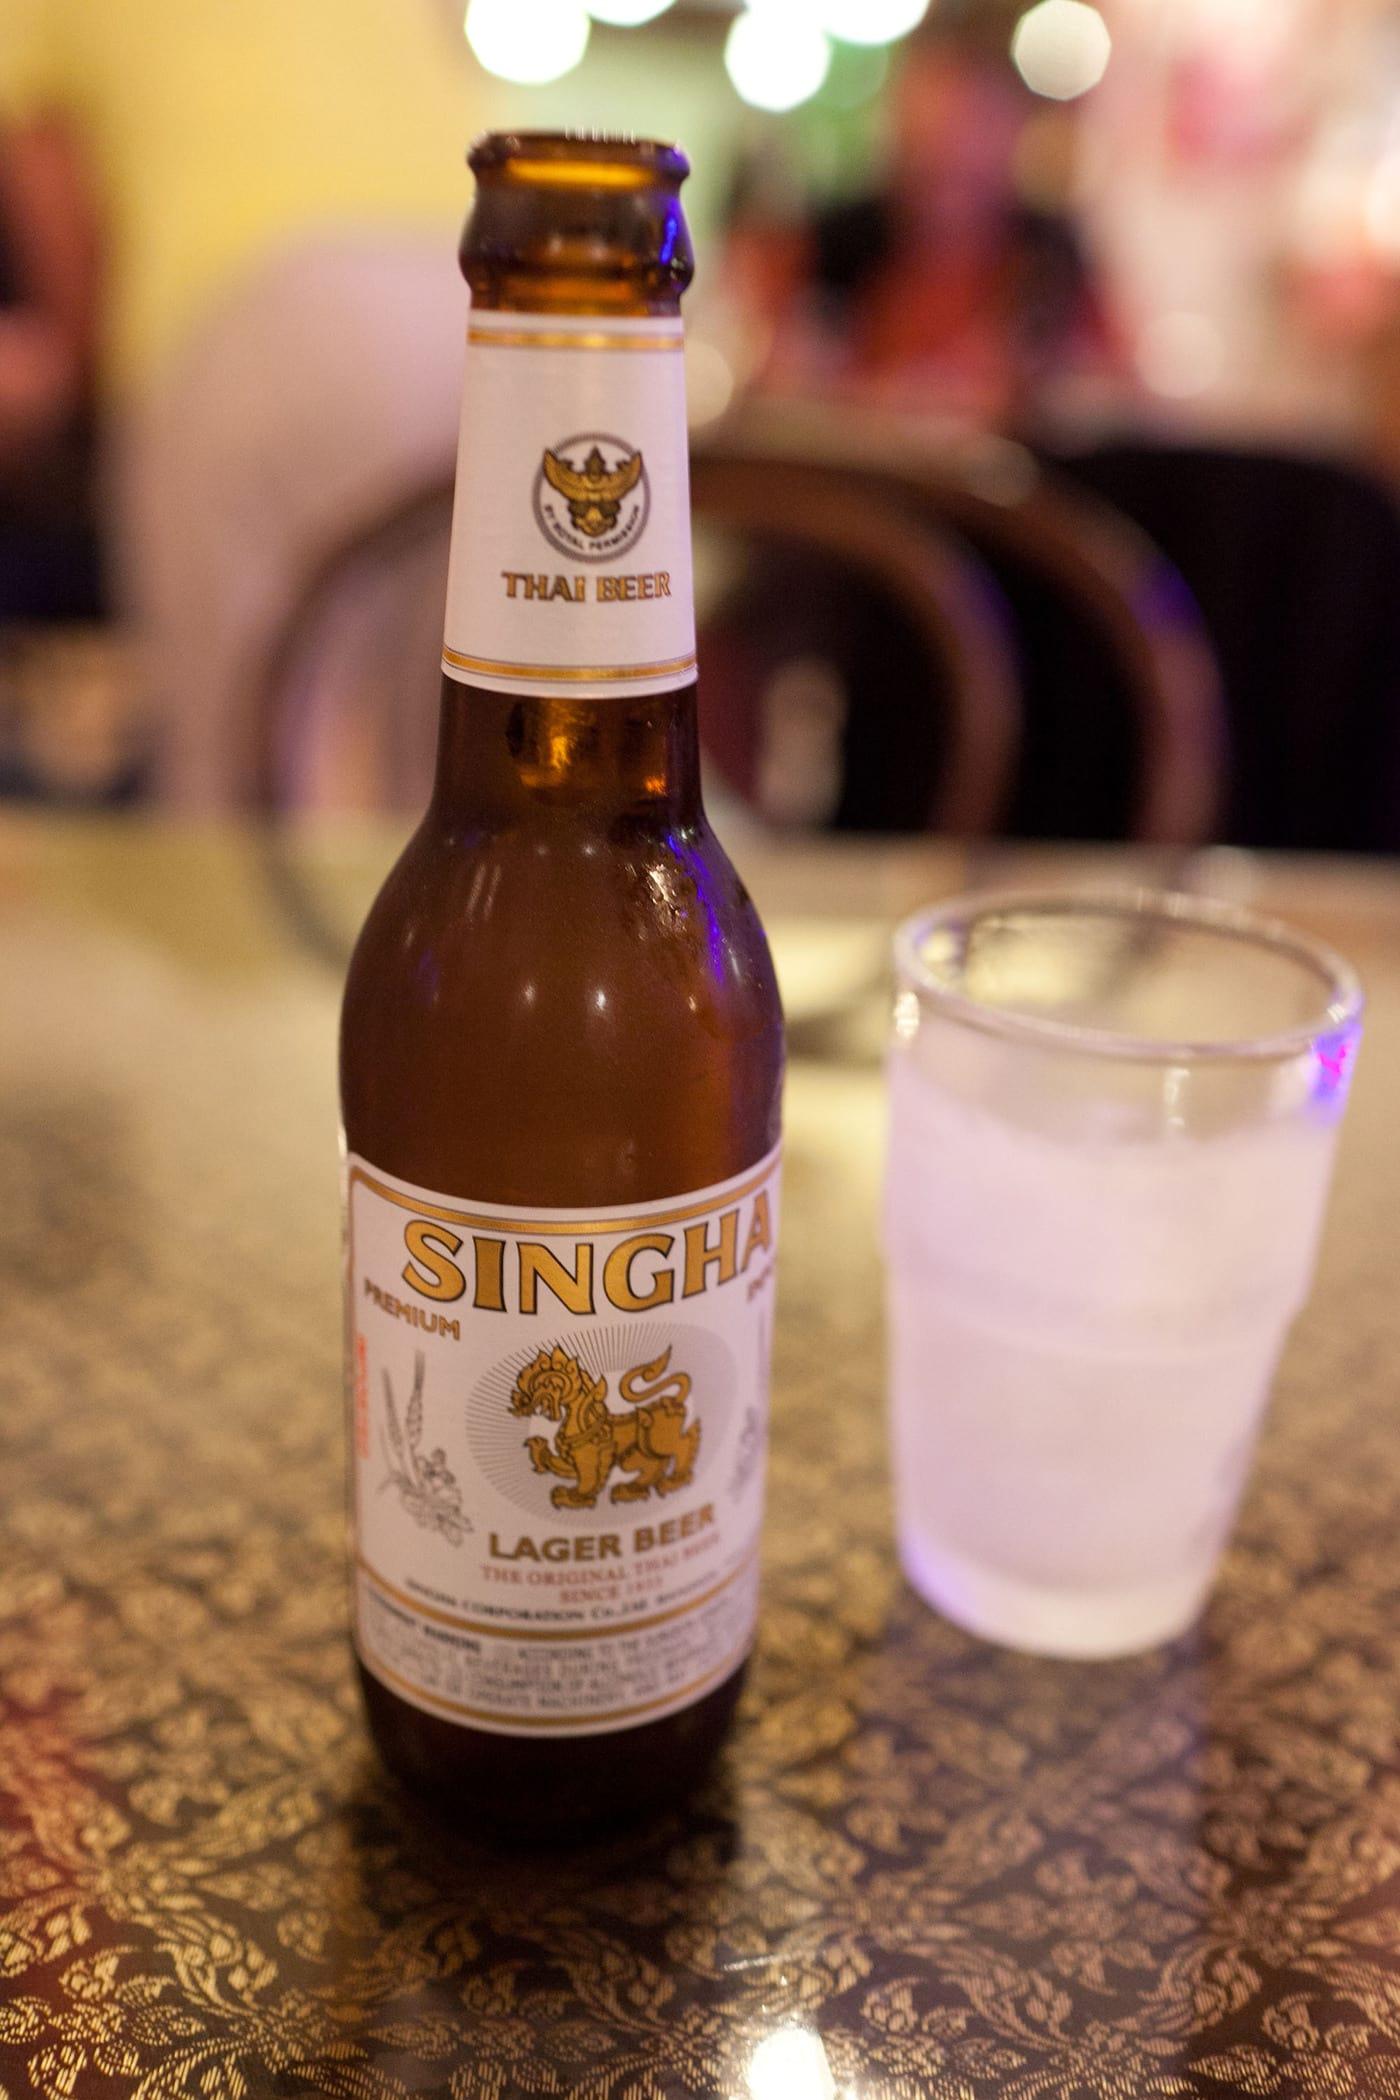 Singha beer at a Thai restaurant on the Big Island in Hawaii.